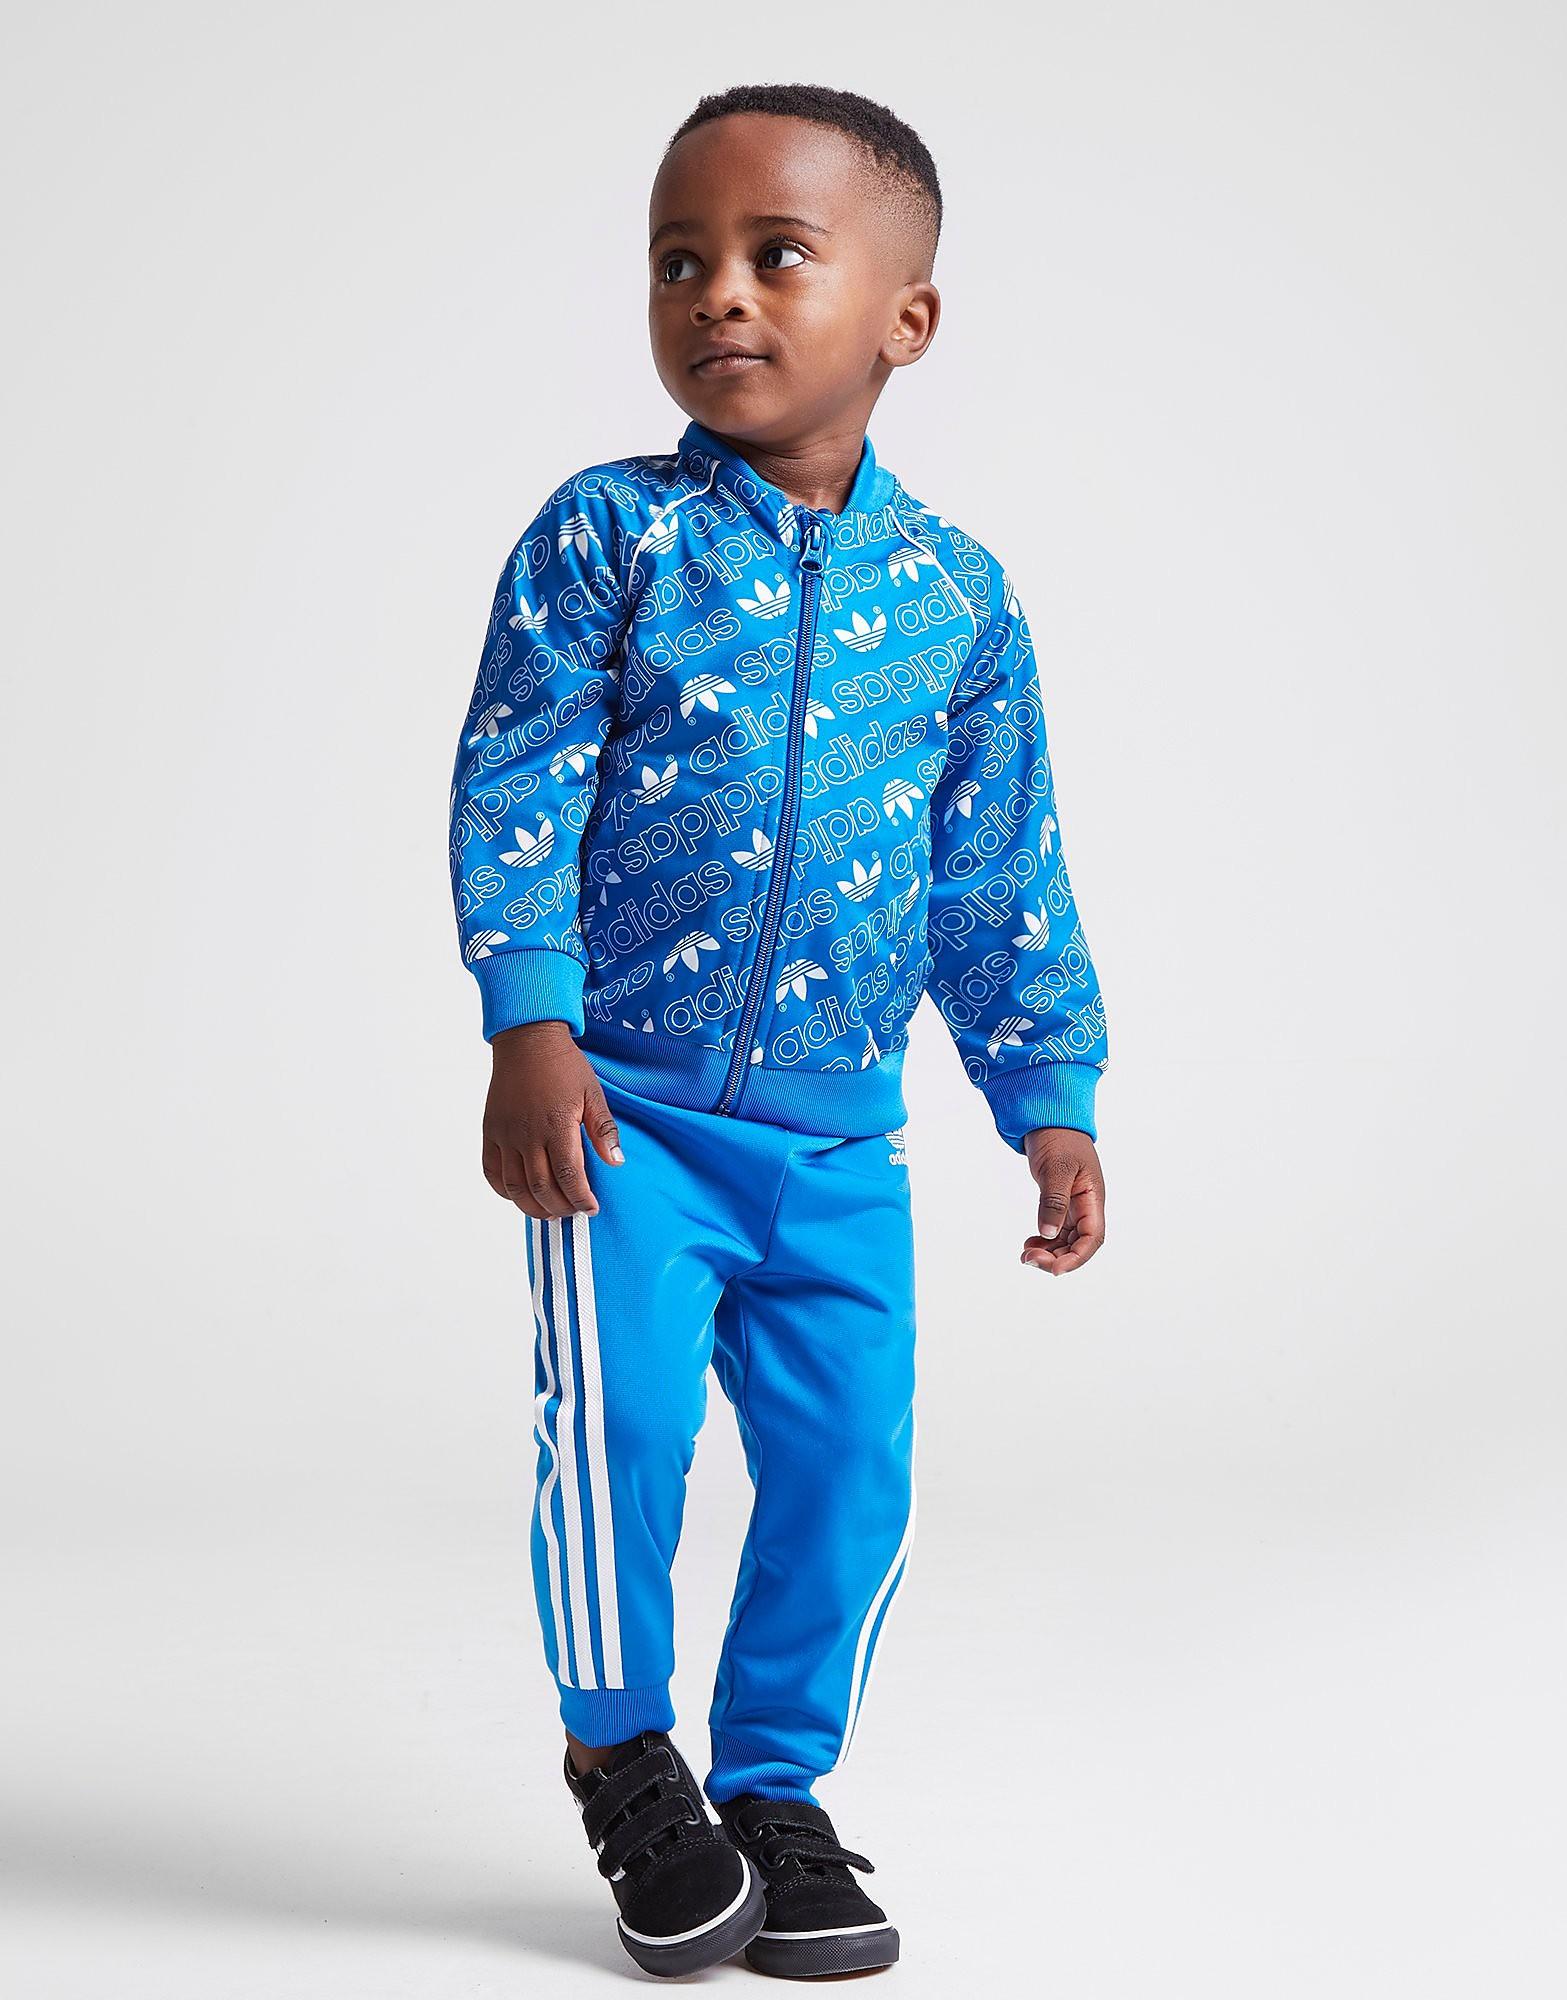 adidas Originals Mono All Over Print Superstar Tracksuit Baby's - Blauw - Kind